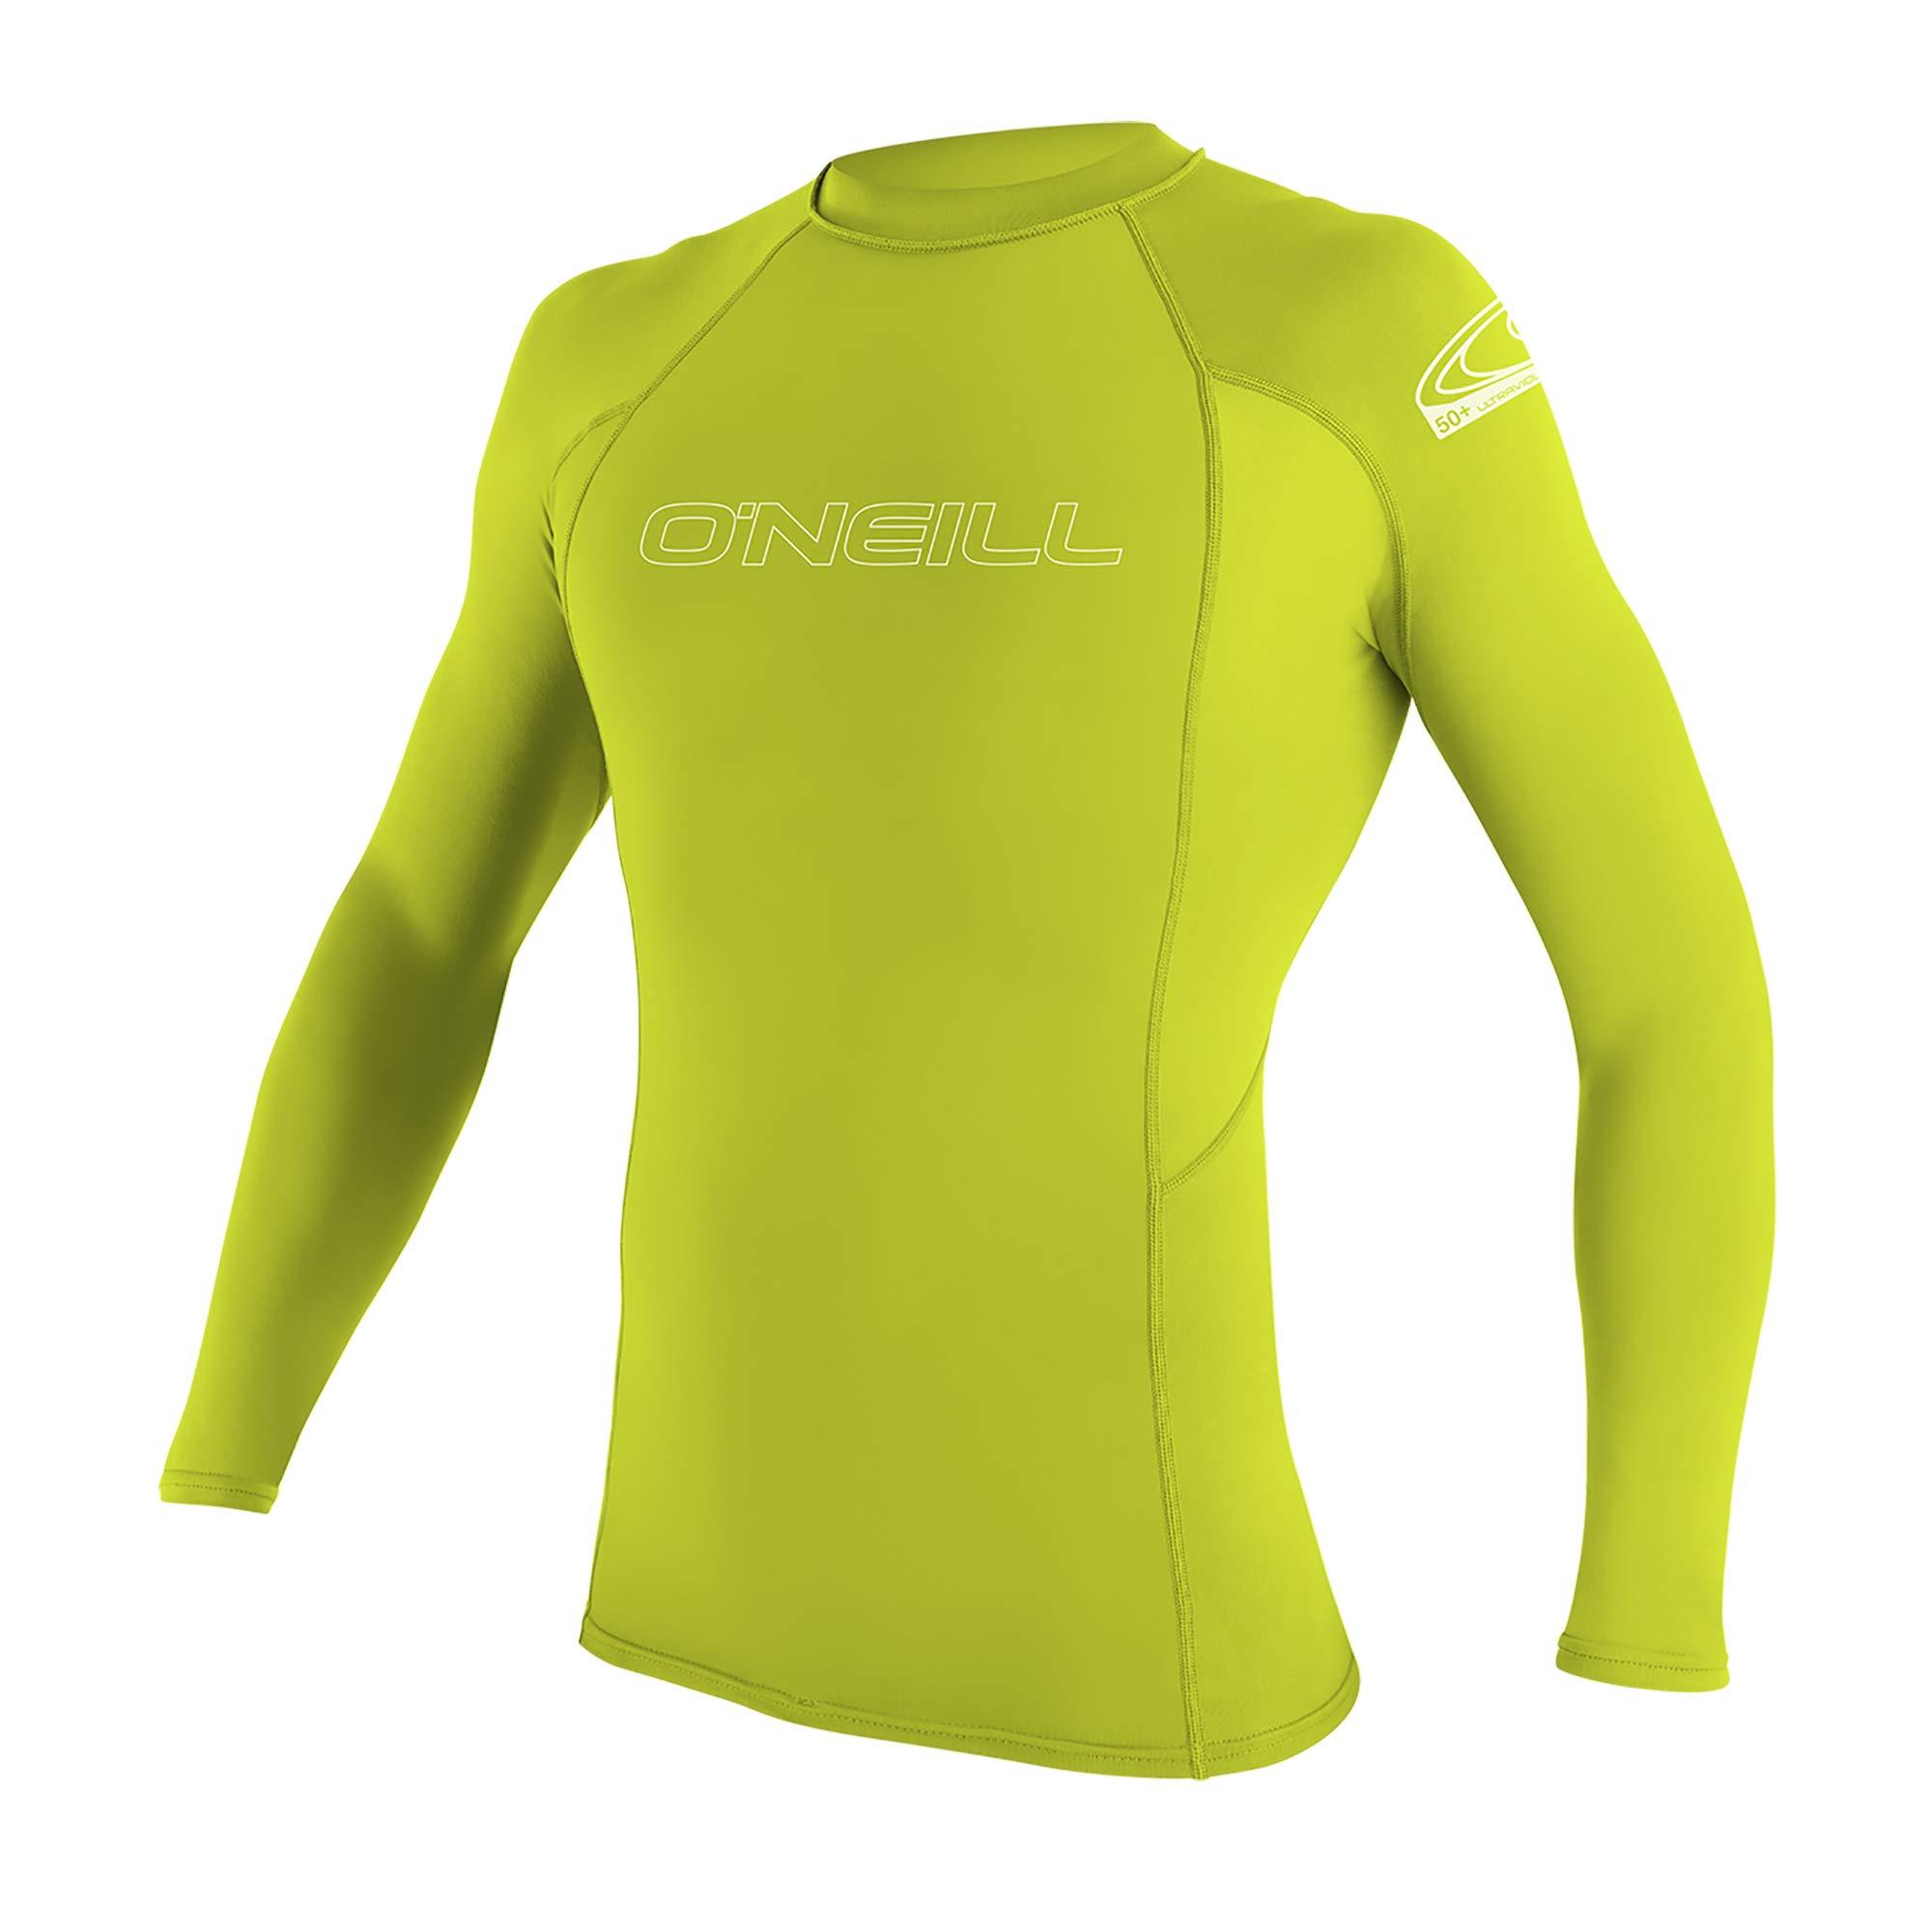 O'Neill Youth Basic Skins UPF 50+ Long Sleeve Rash Guard, Lime, 4